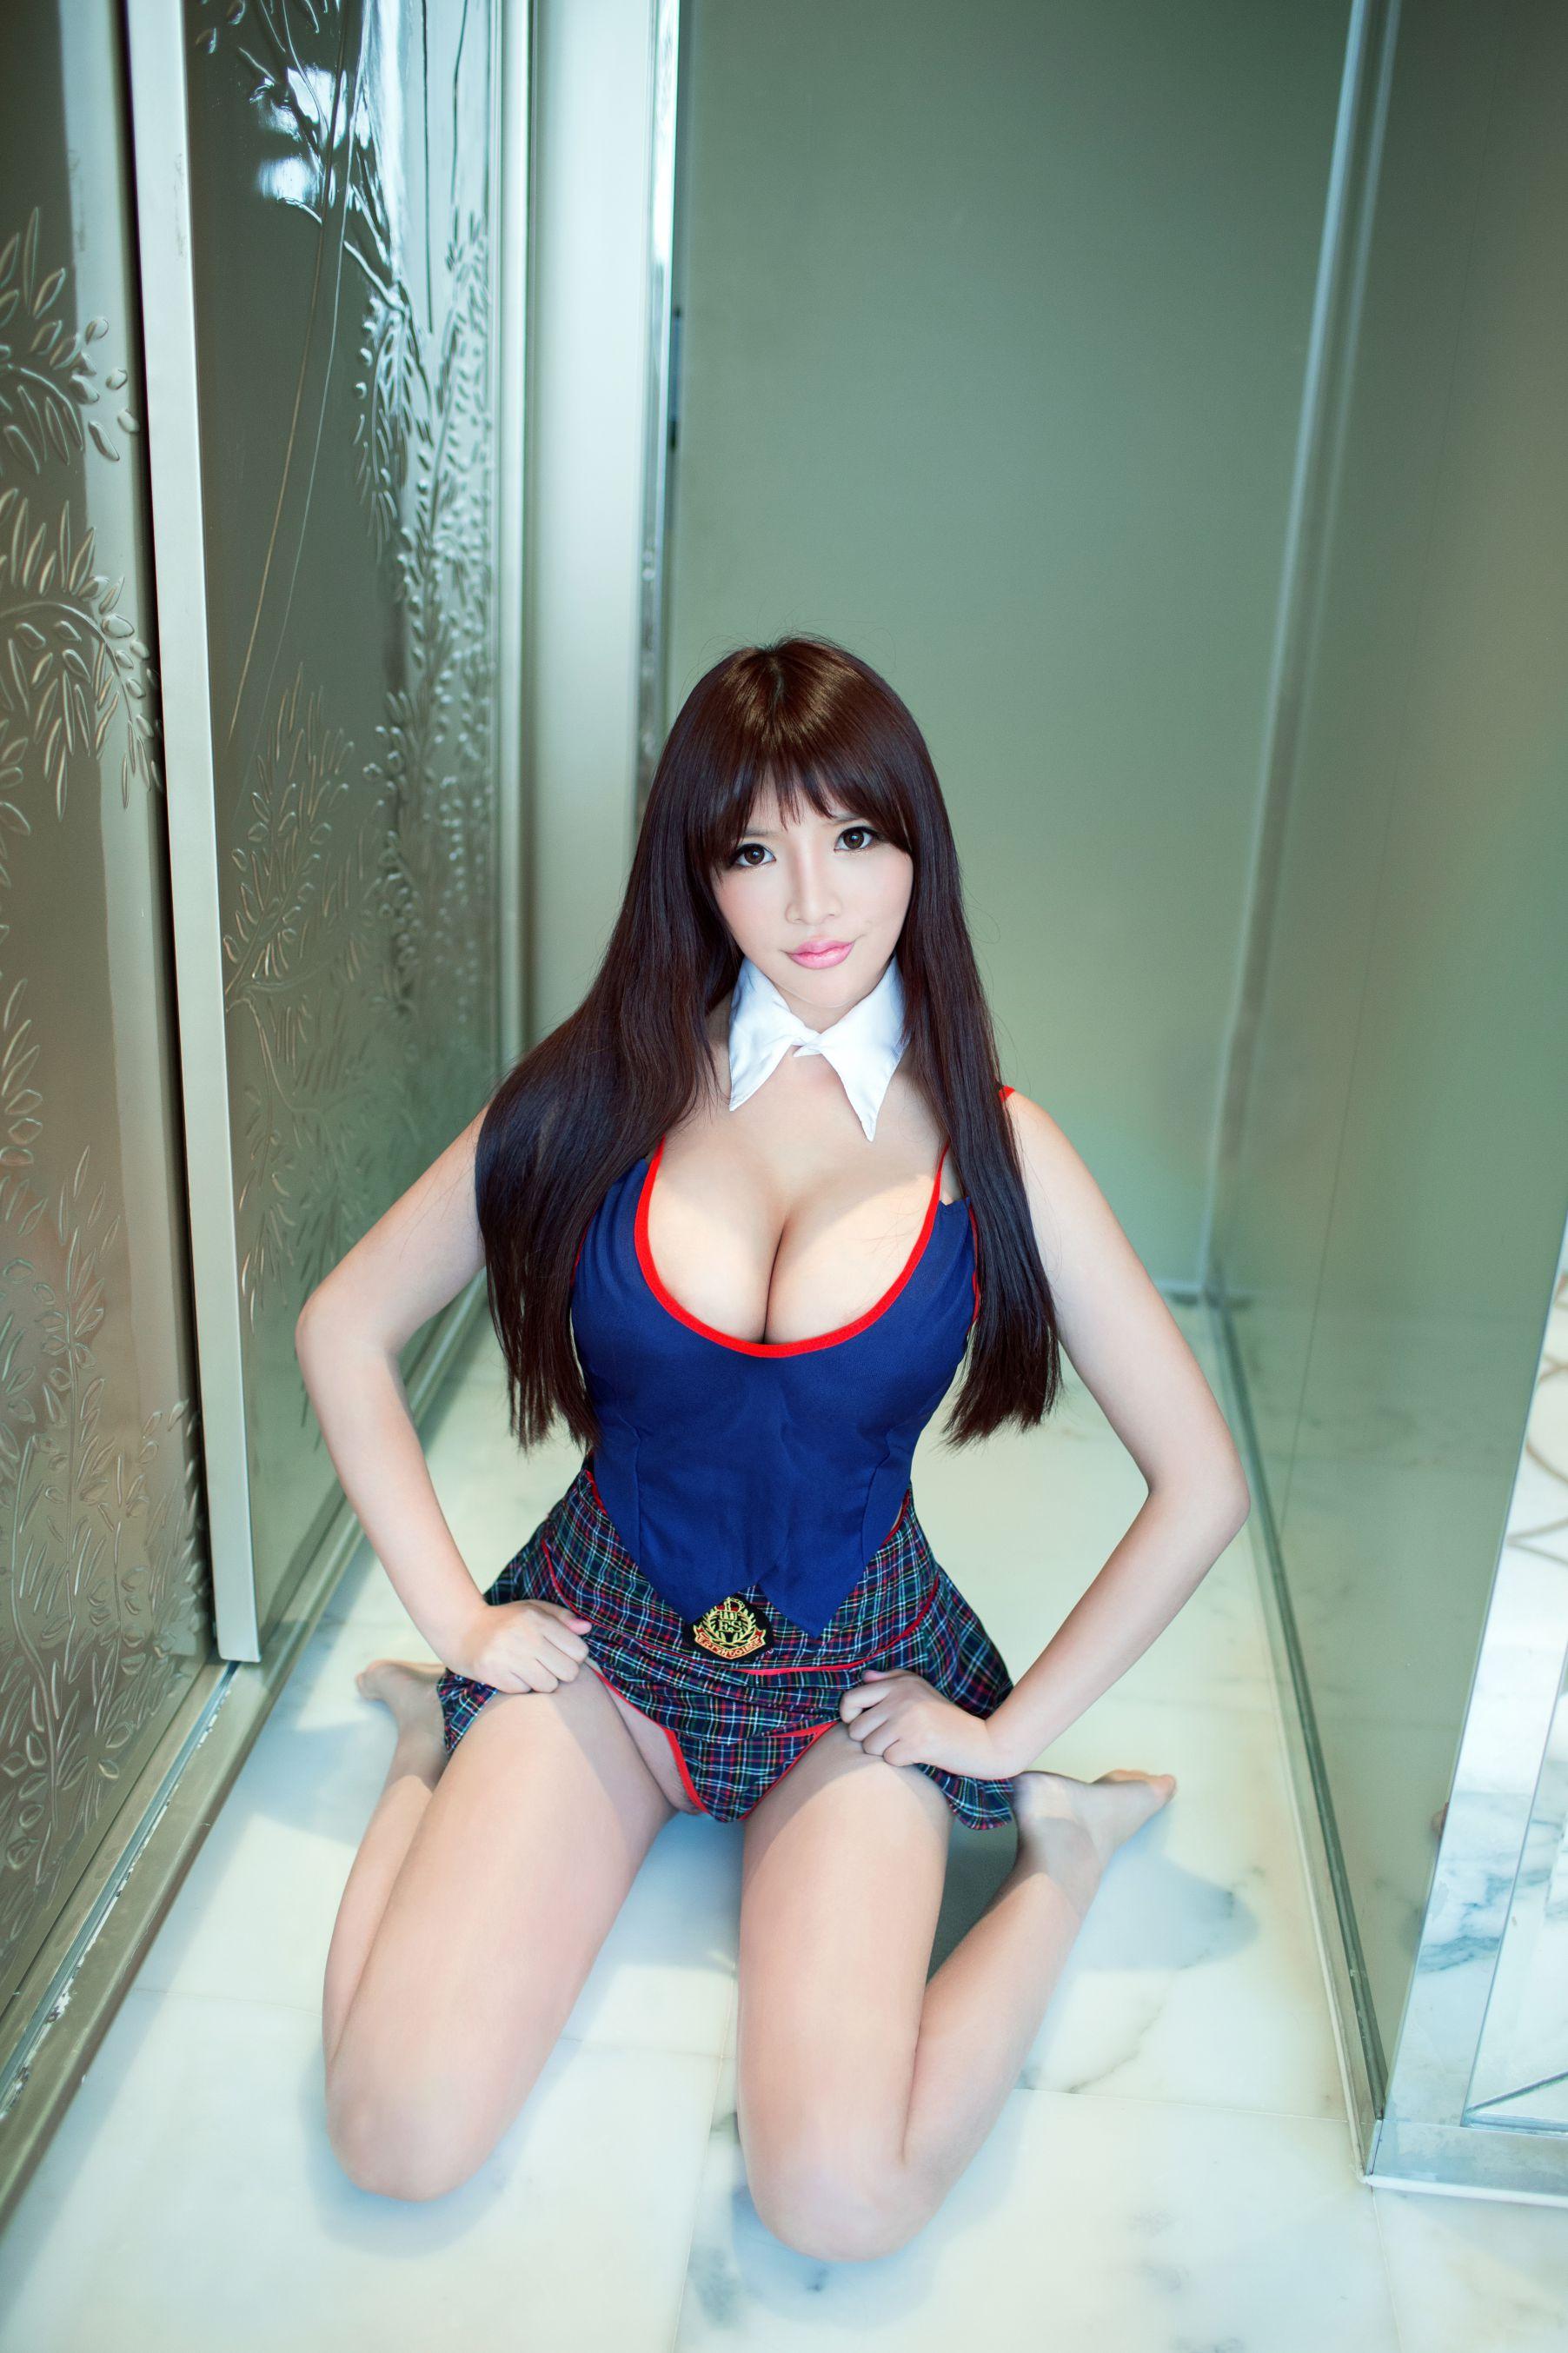 VOL.1249 [推女郎]美腿妹子嫩模美乳爆乳:王依萌(推女郎王依萌)超高清写真套图(28P)